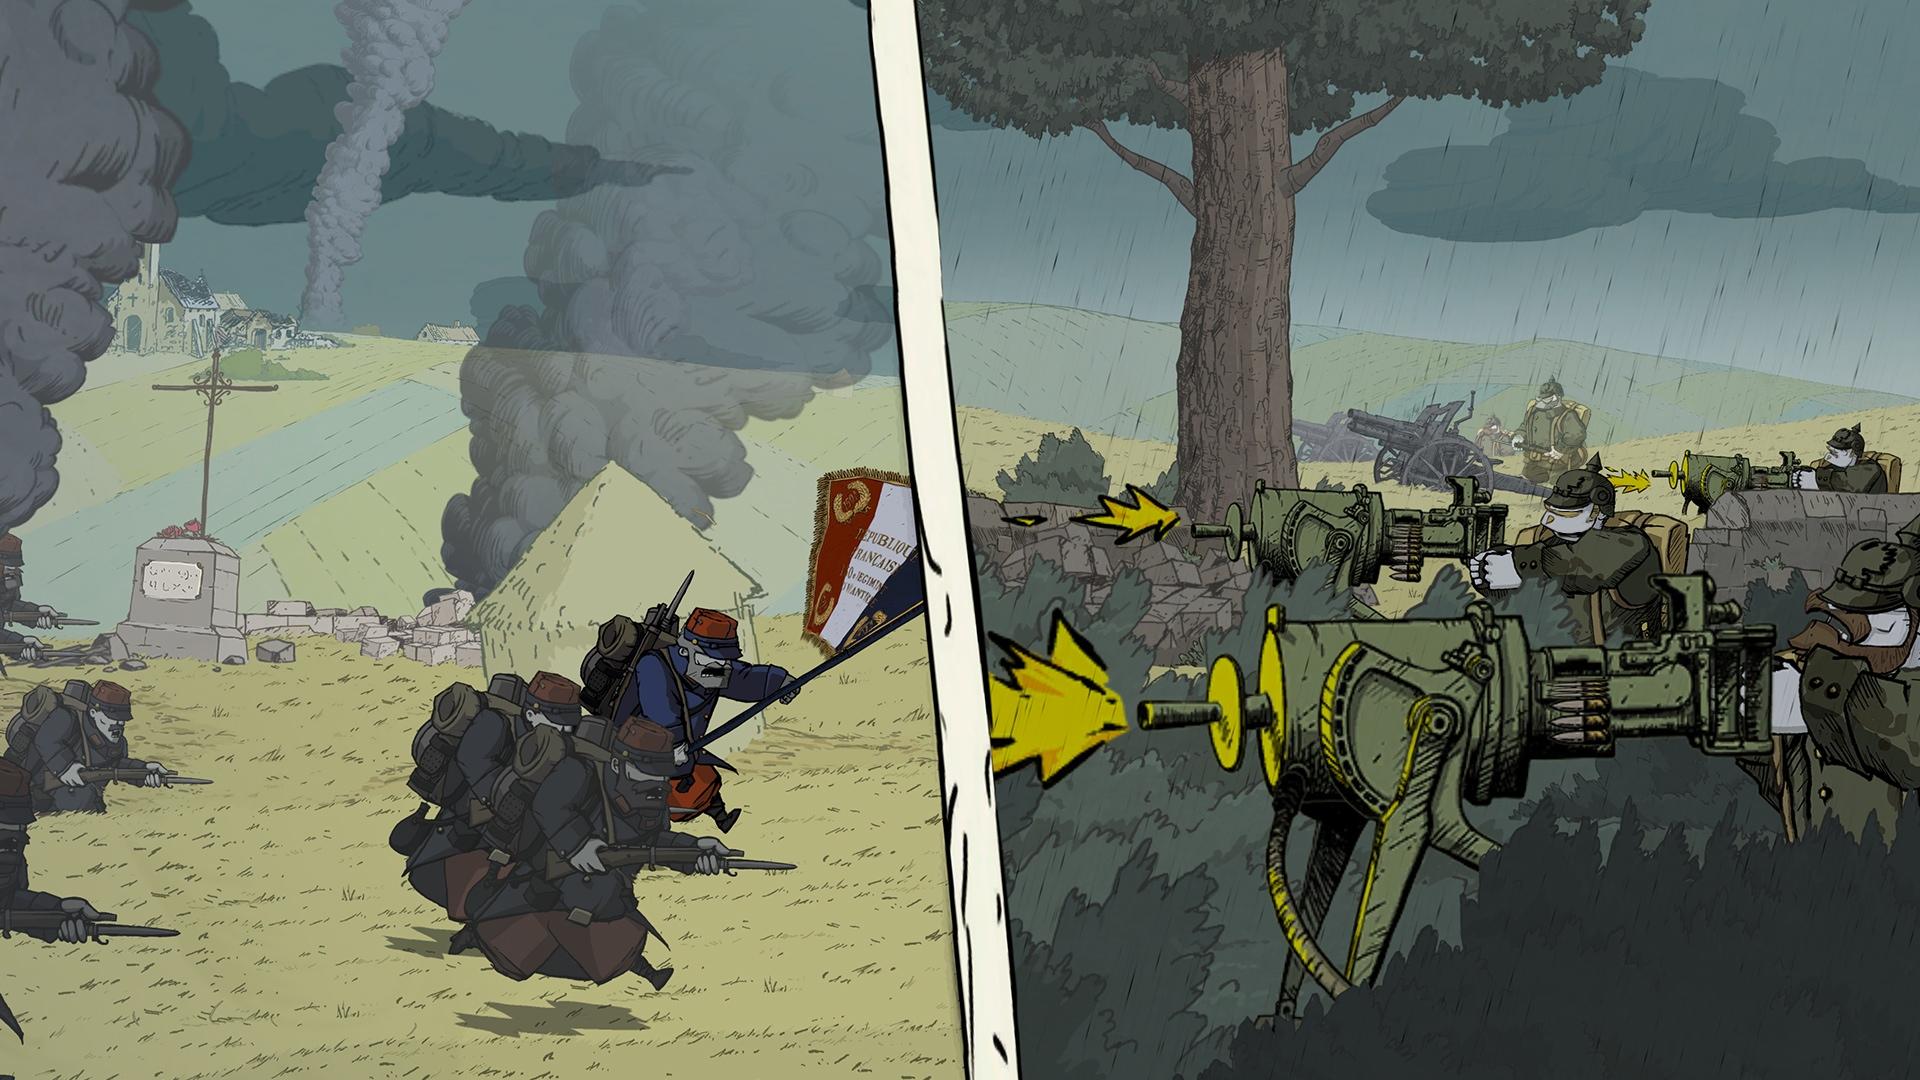 Action_battlefield